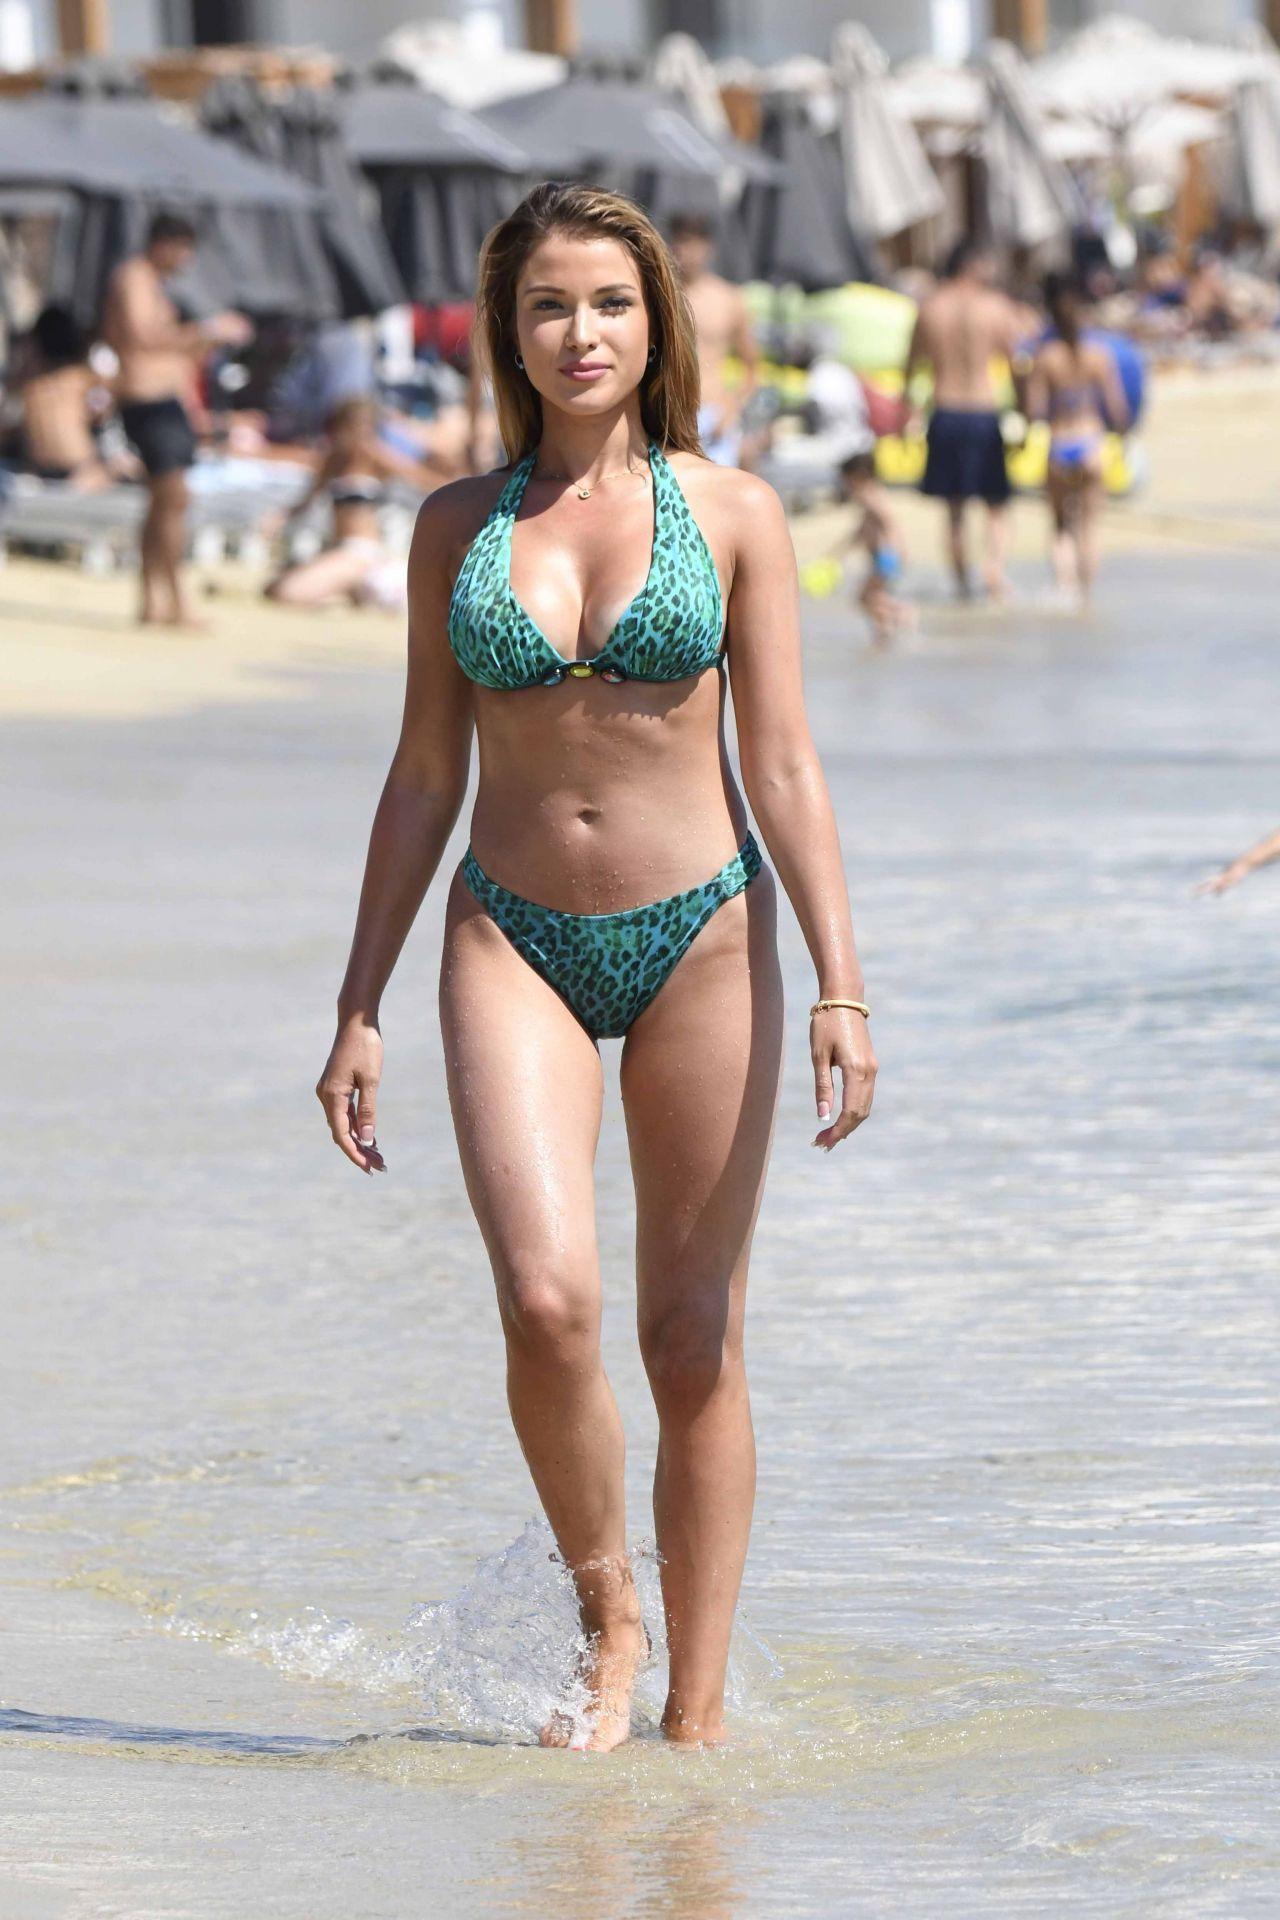 Brianna Addolorato Ass,Lena wann topless photos XXX videos Renee Zellweger Nude  The Whole Truth - 2016,Briahna Gilbert Tits